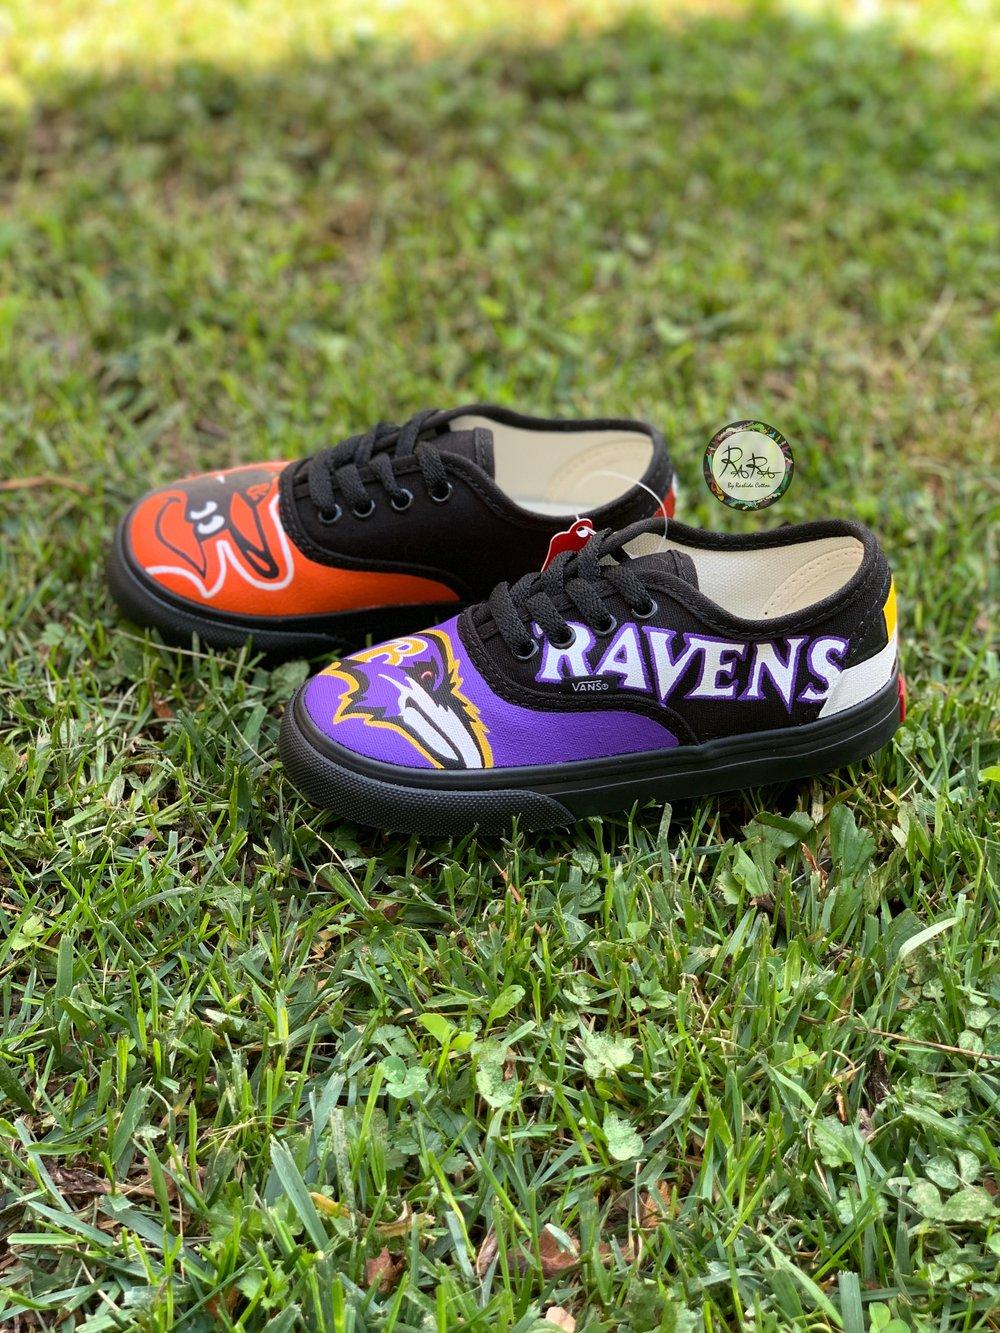 Image of Ravens x Orioles Toddler Authentic Vans